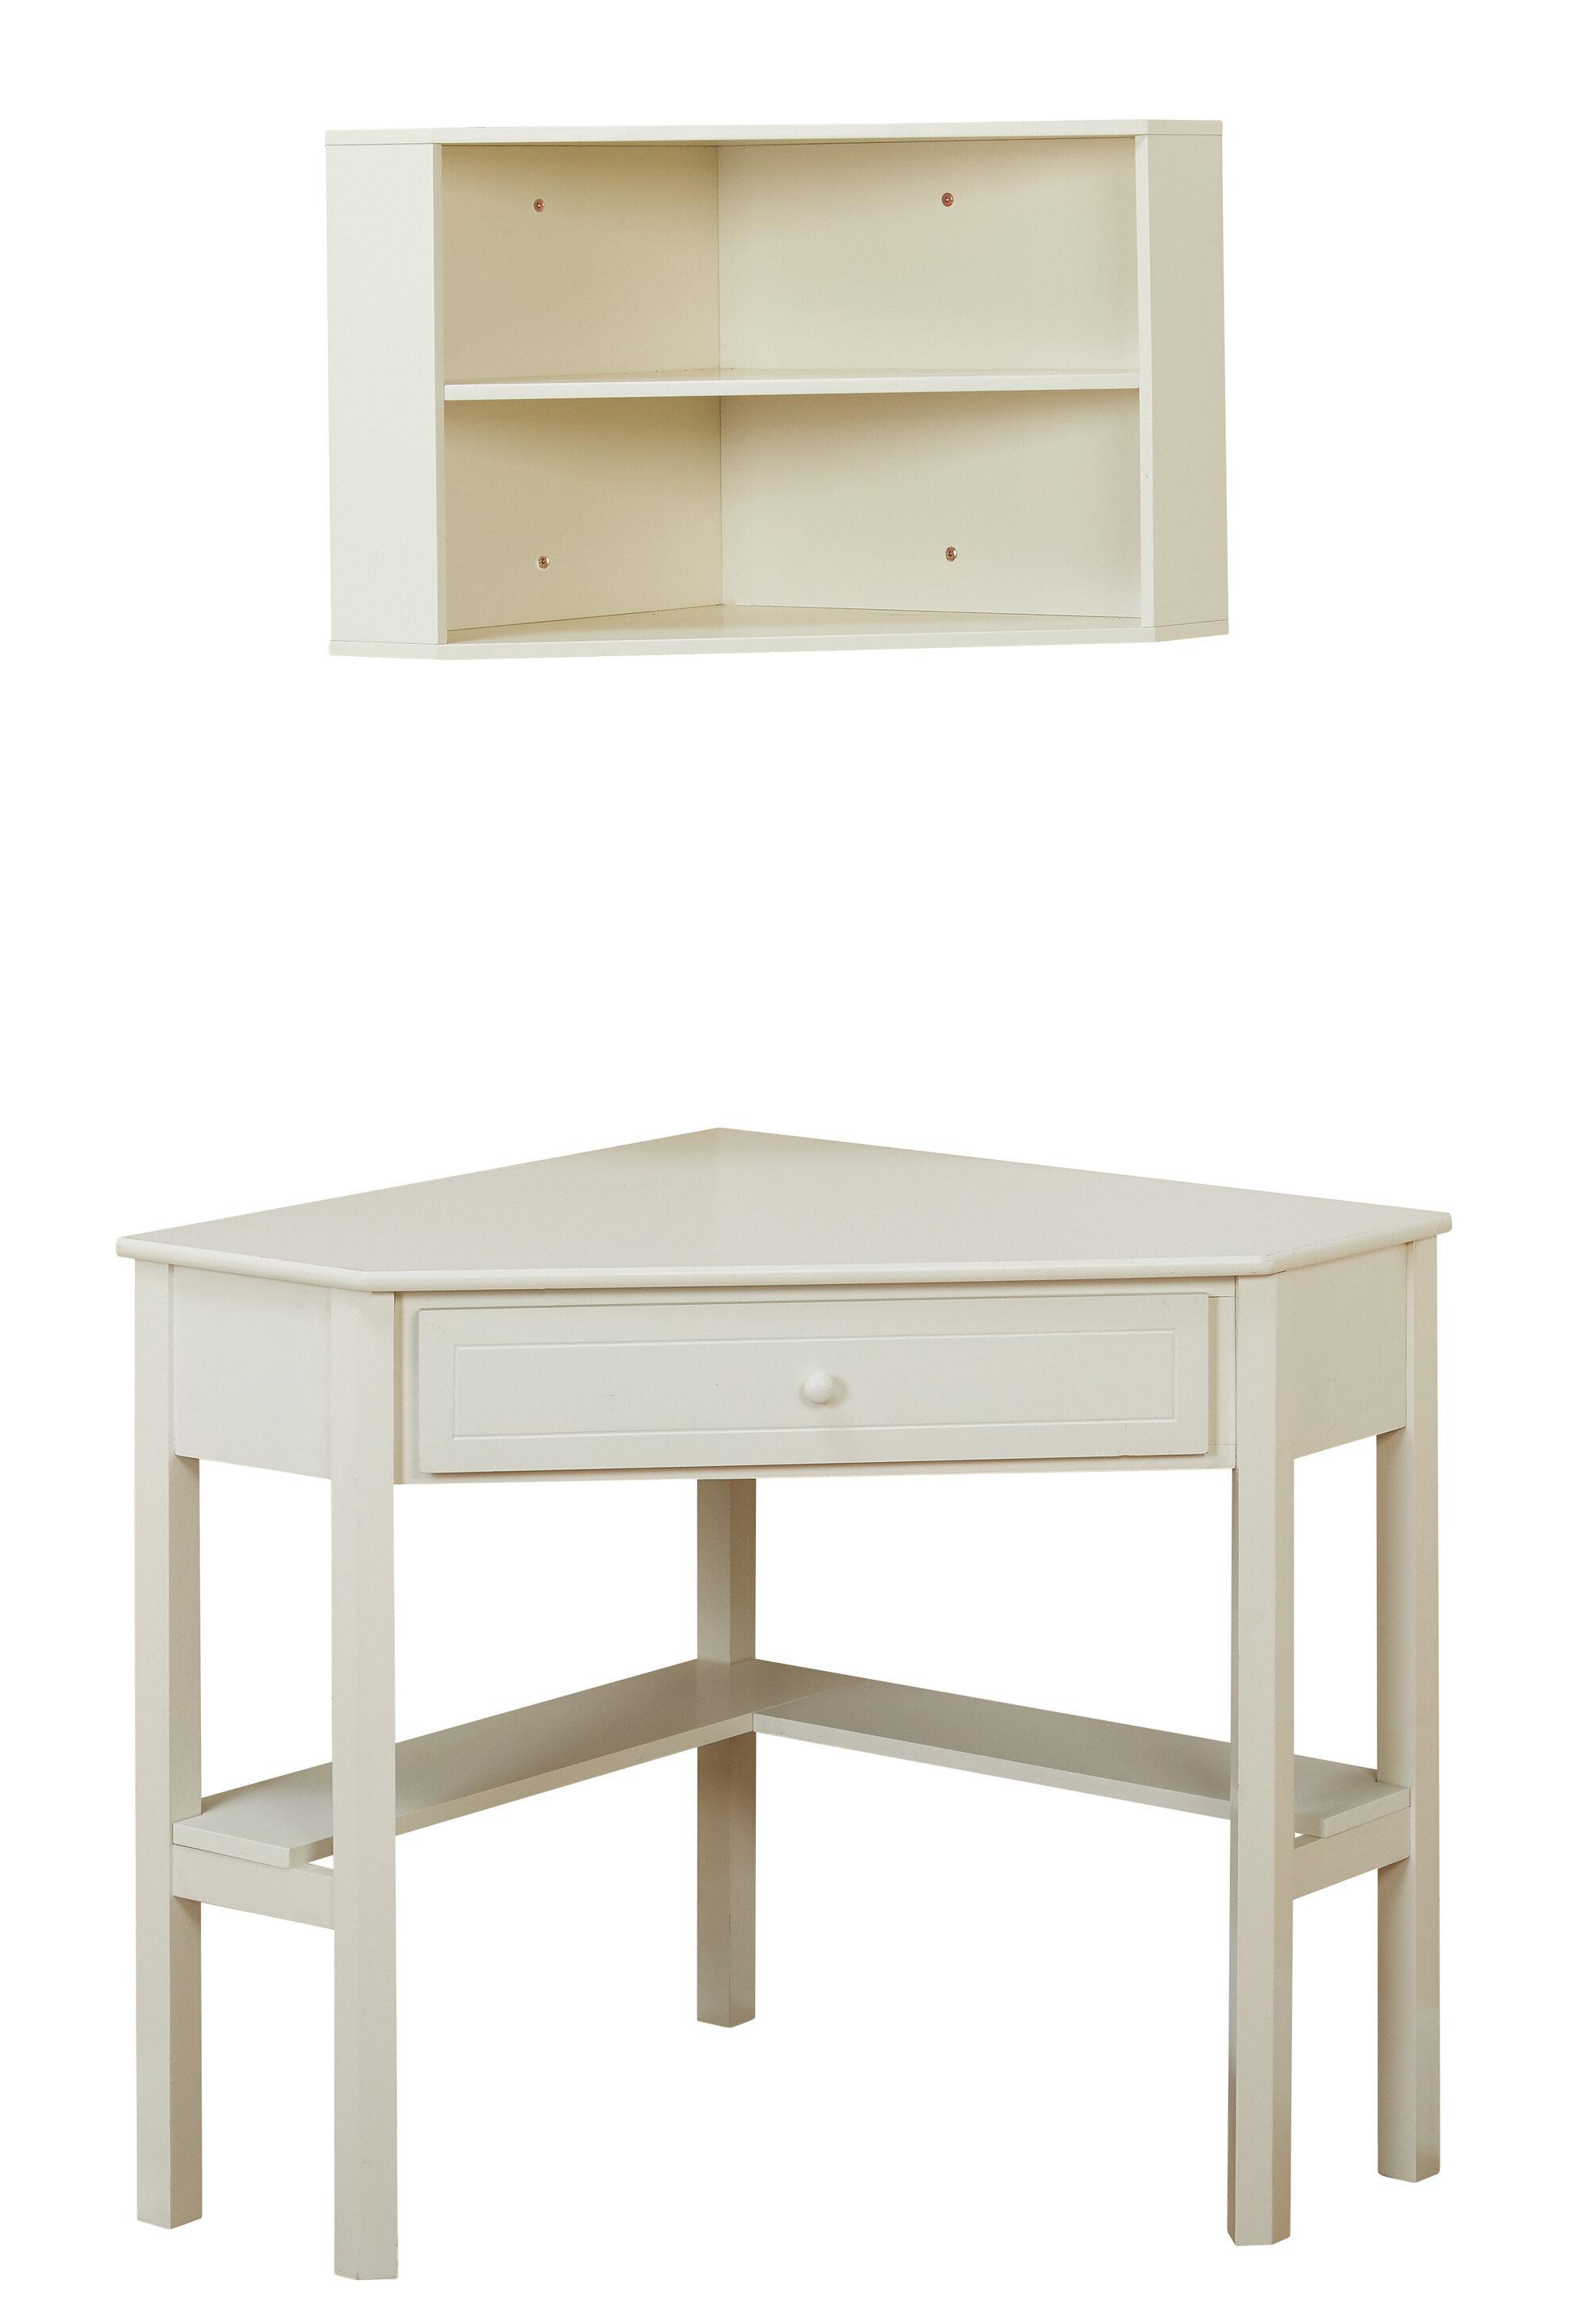 Image of: Corner White Desks You Ll Love In 2020 Wayfair